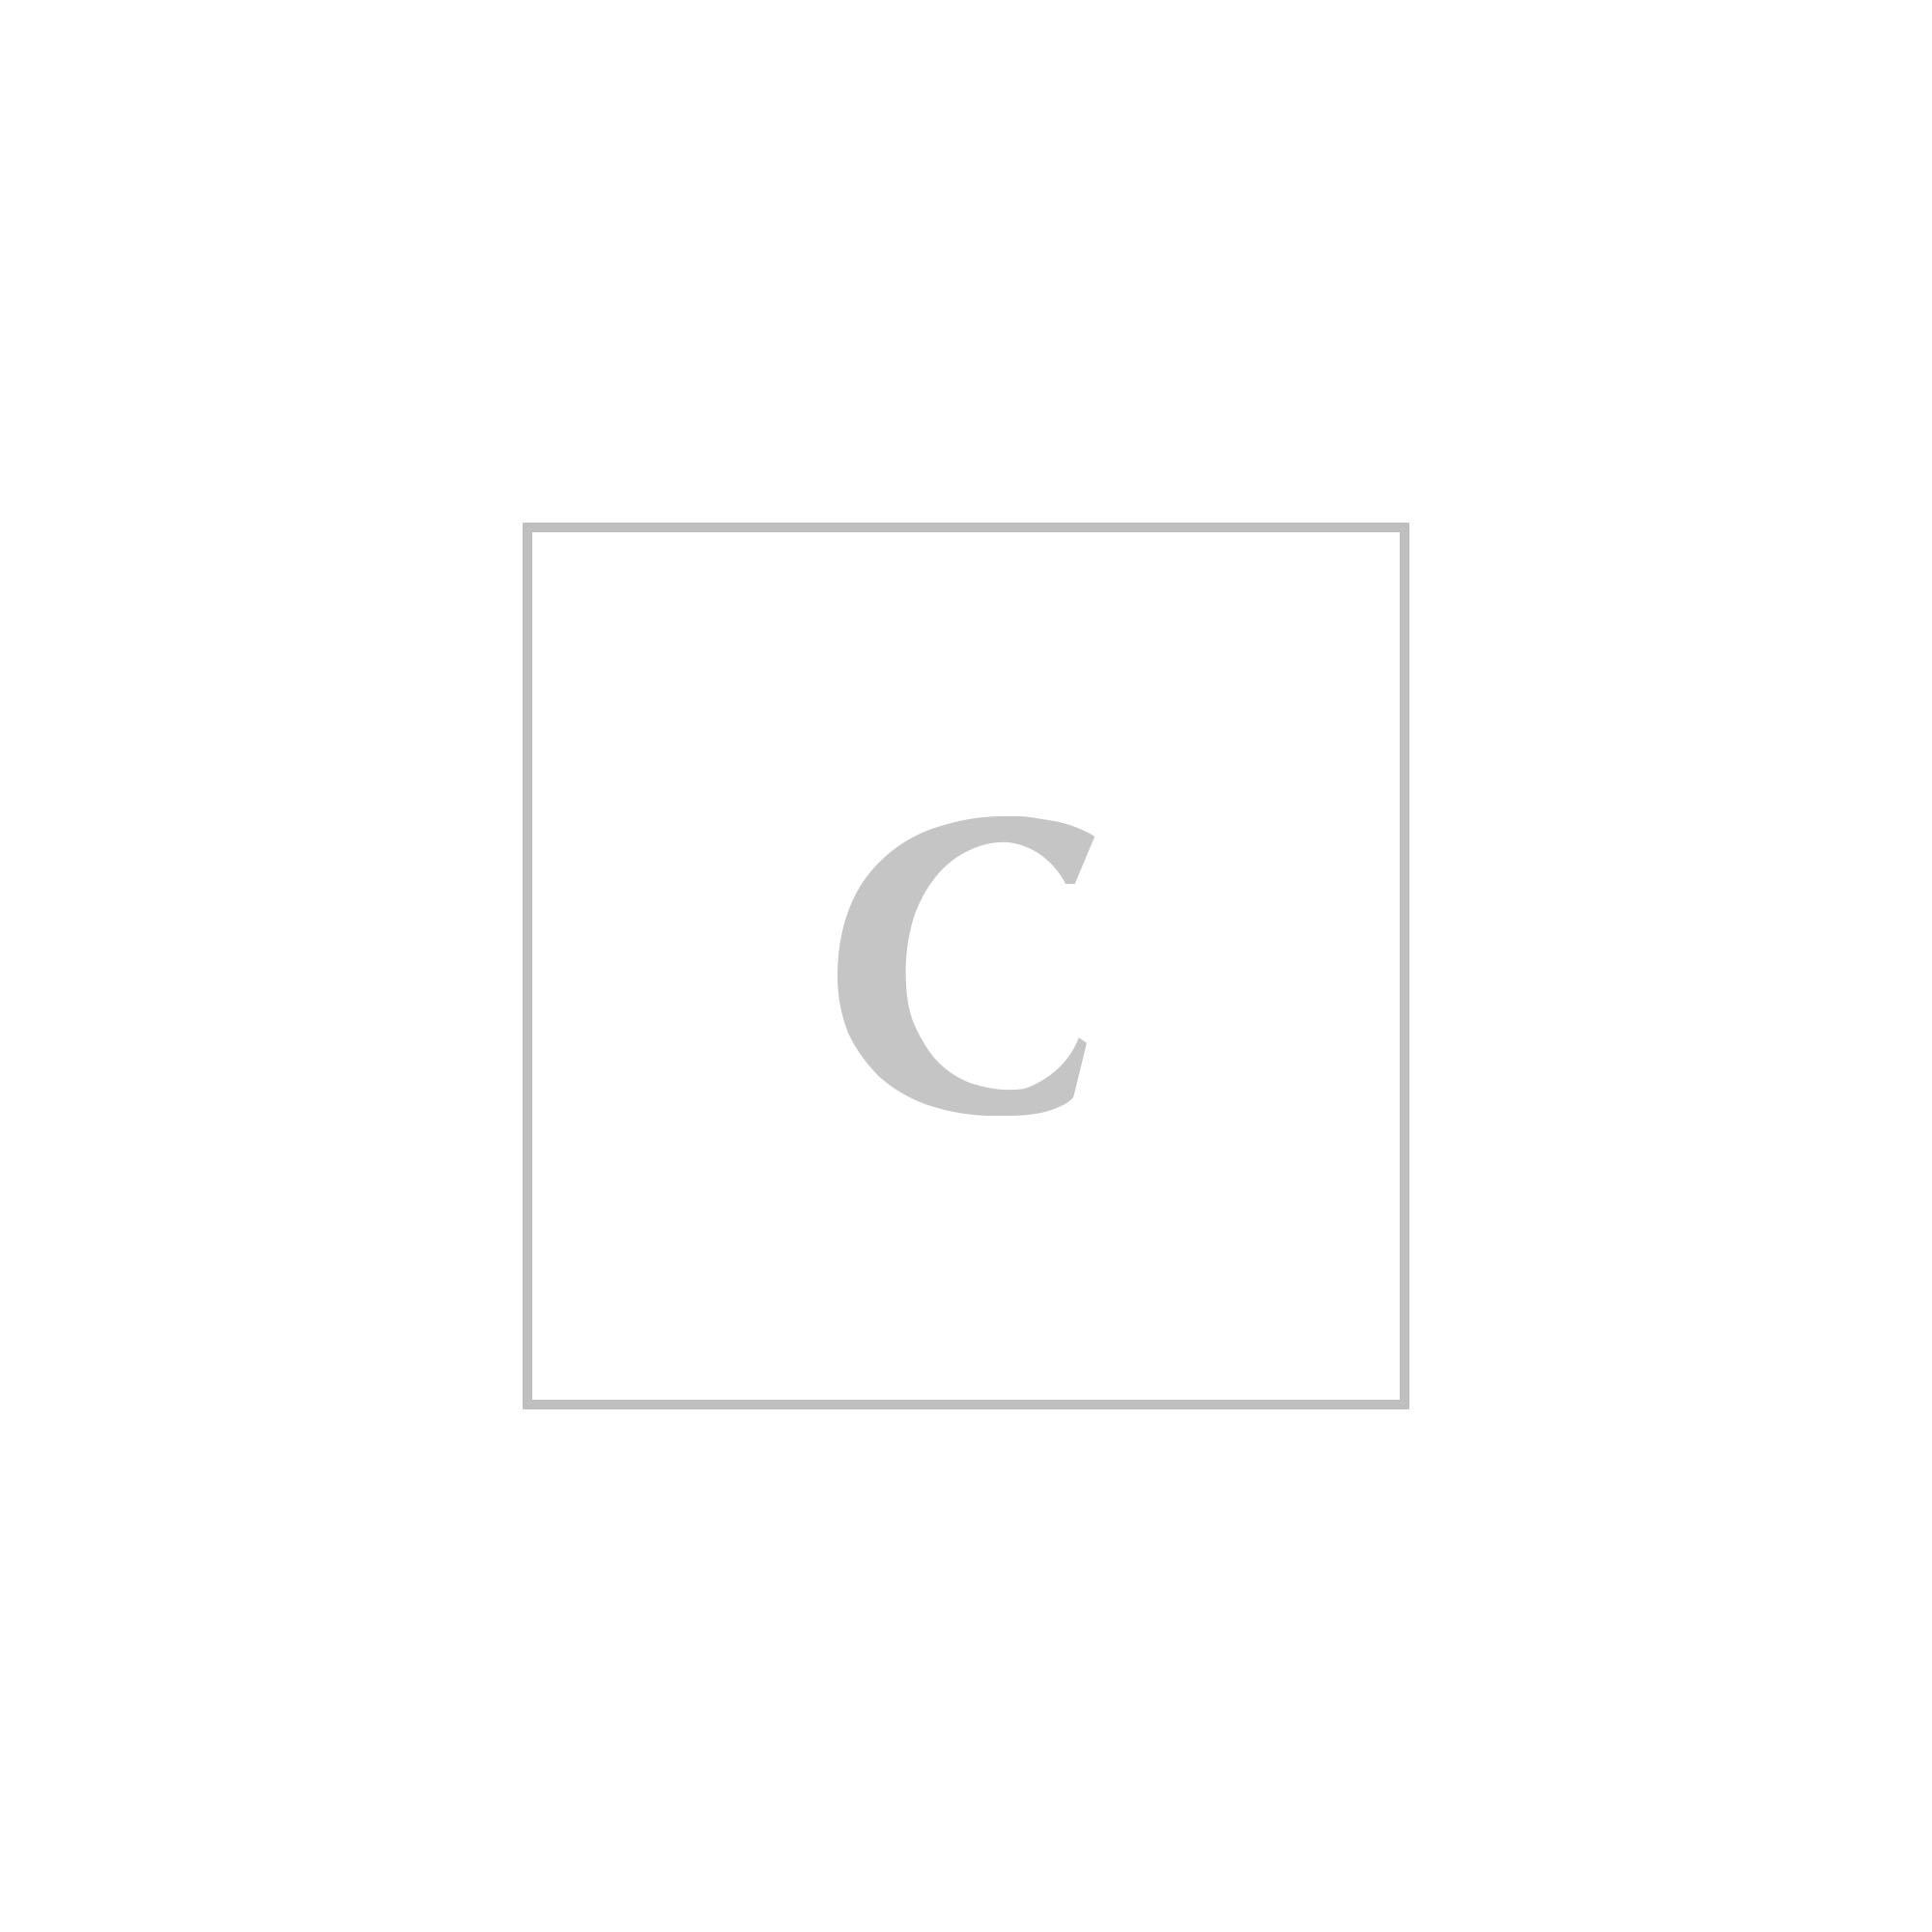 Christian Dior grained open bar bag